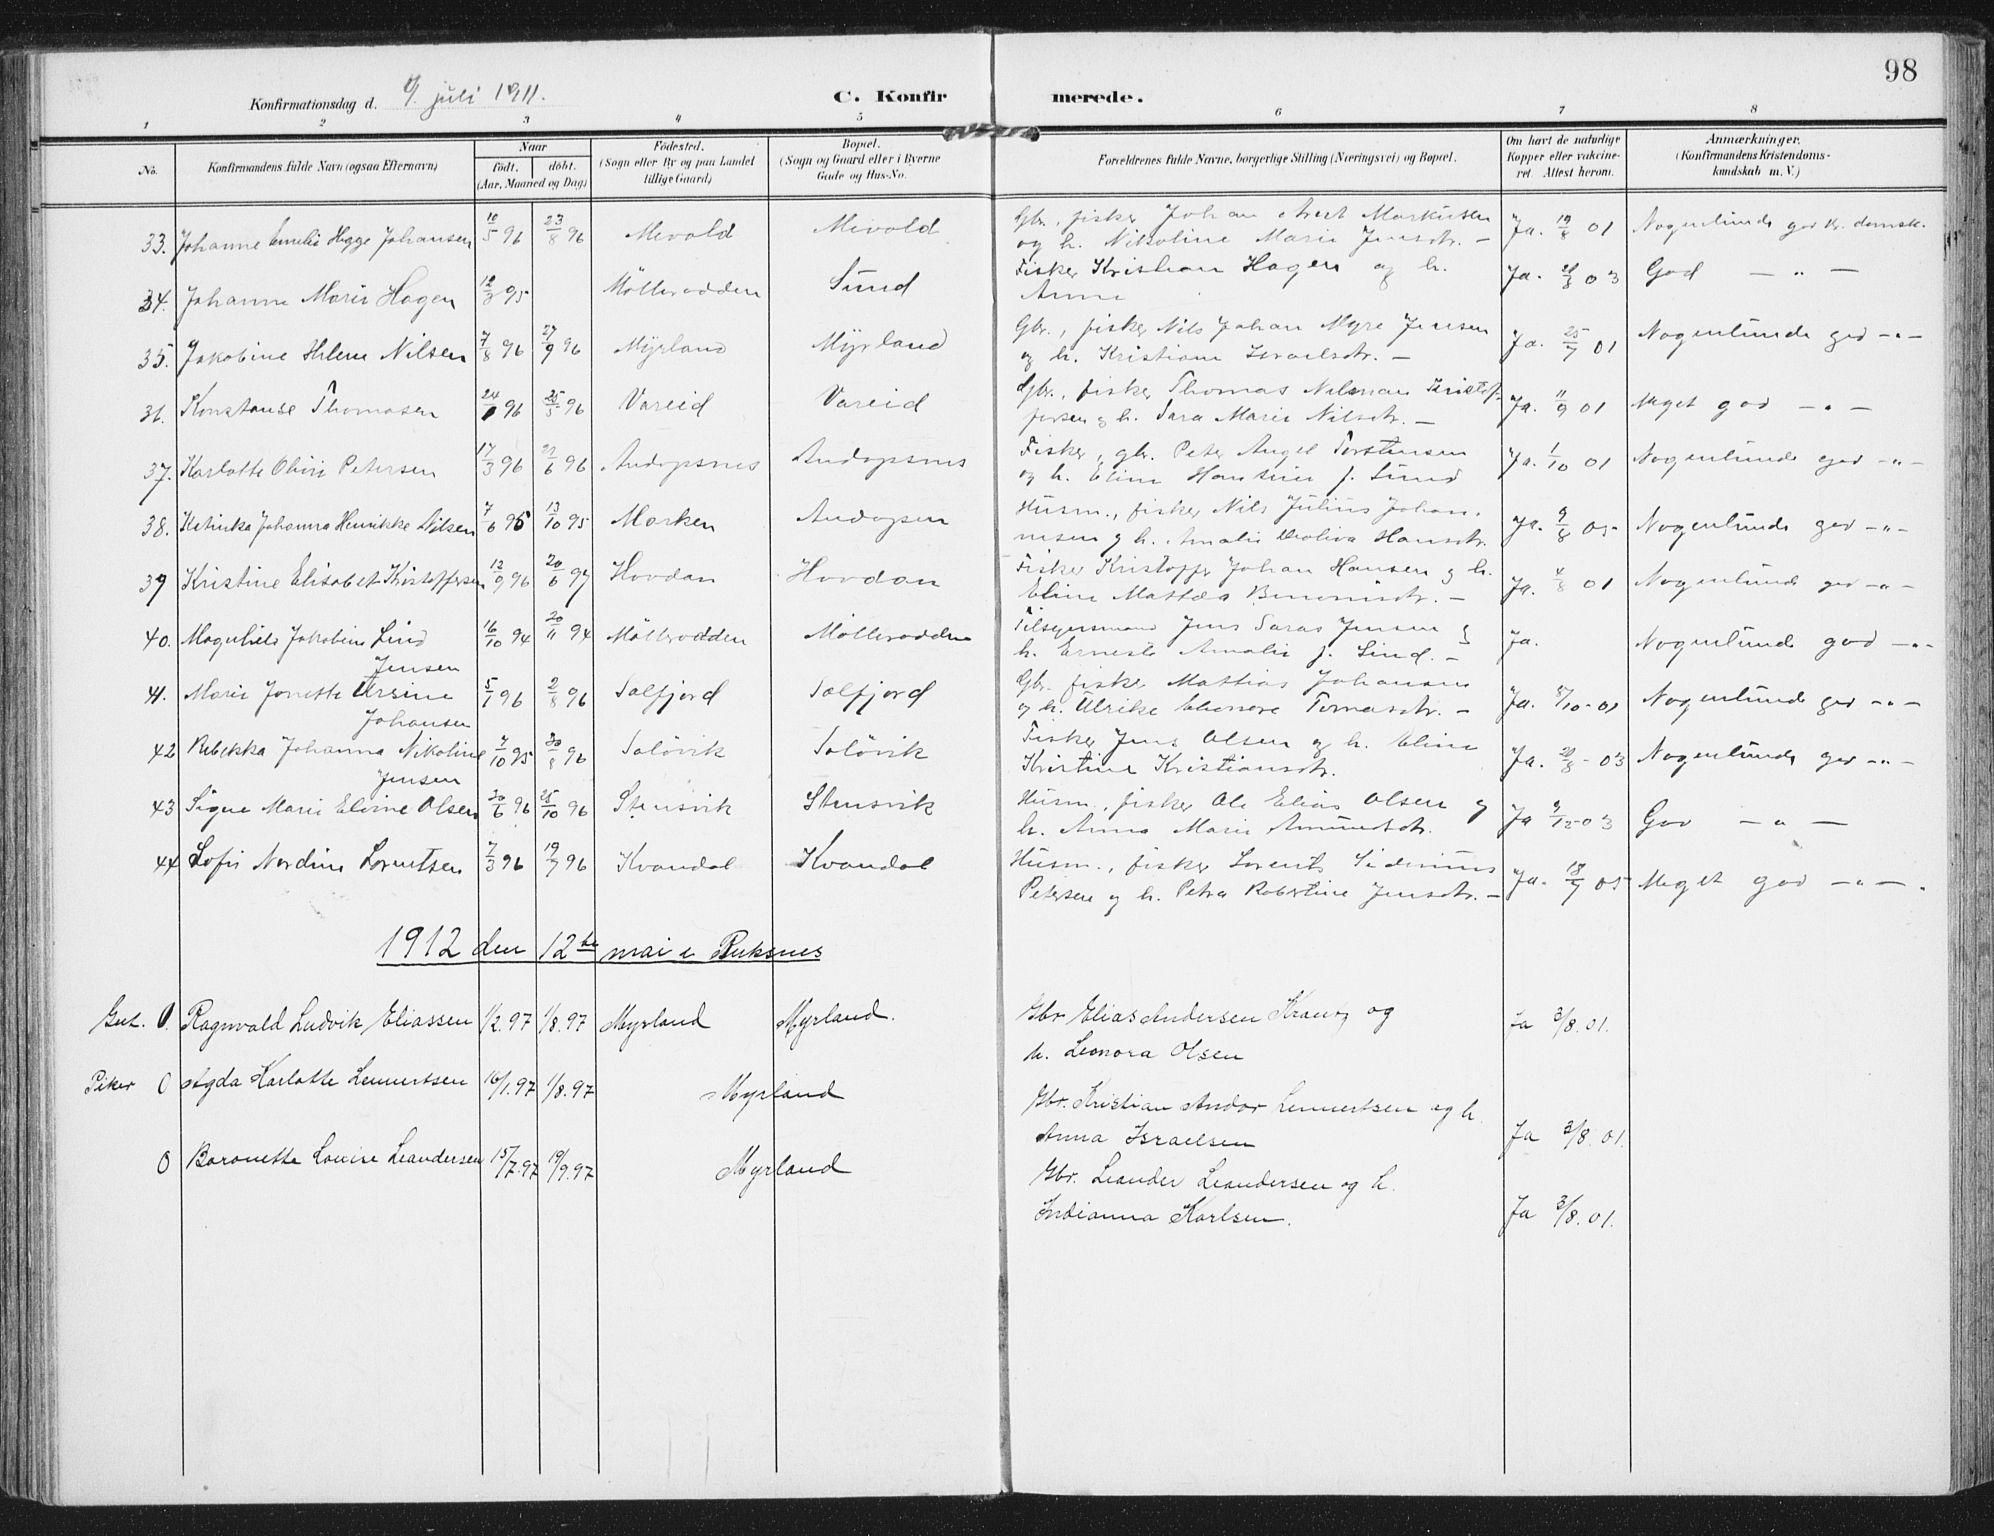 SAT, Ministerialprotokoller, klokkerbøker og fødselsregistre - Nordland, 885/L1206: Ministerialbok nr. 885A07, 1905-1915, s. 98